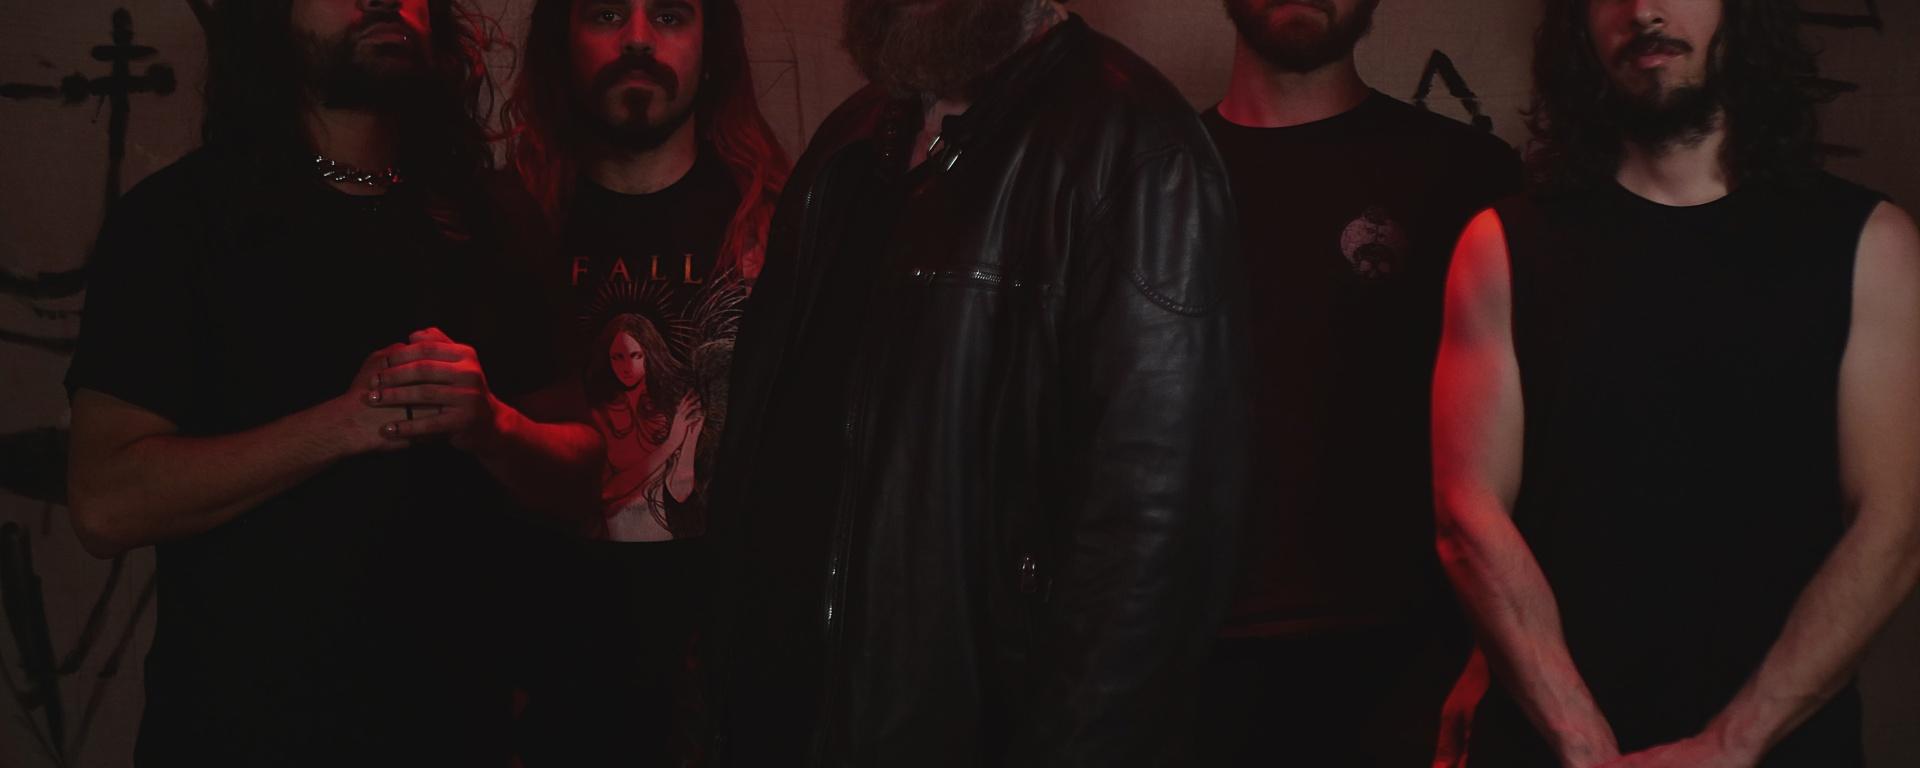 "Rockshots Records: NAHAYA Share Some Texan Slide In New Music Video ""Incubator"", New Album May 21st"